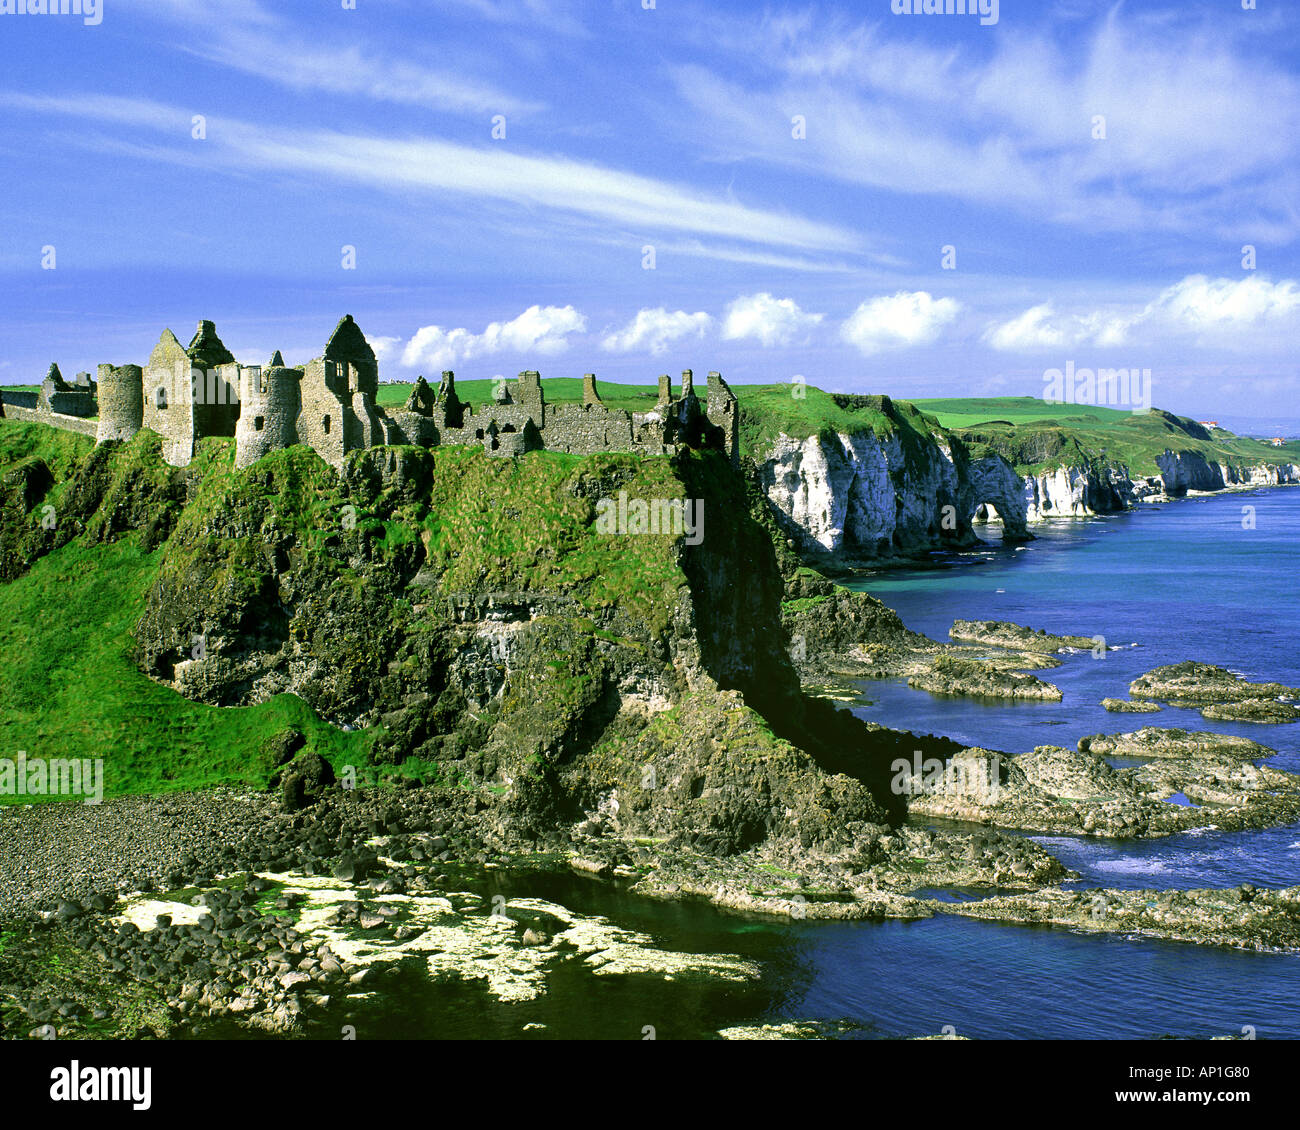 GB - NORTHERN IRELAND: Dunluce Castle - Stock Image